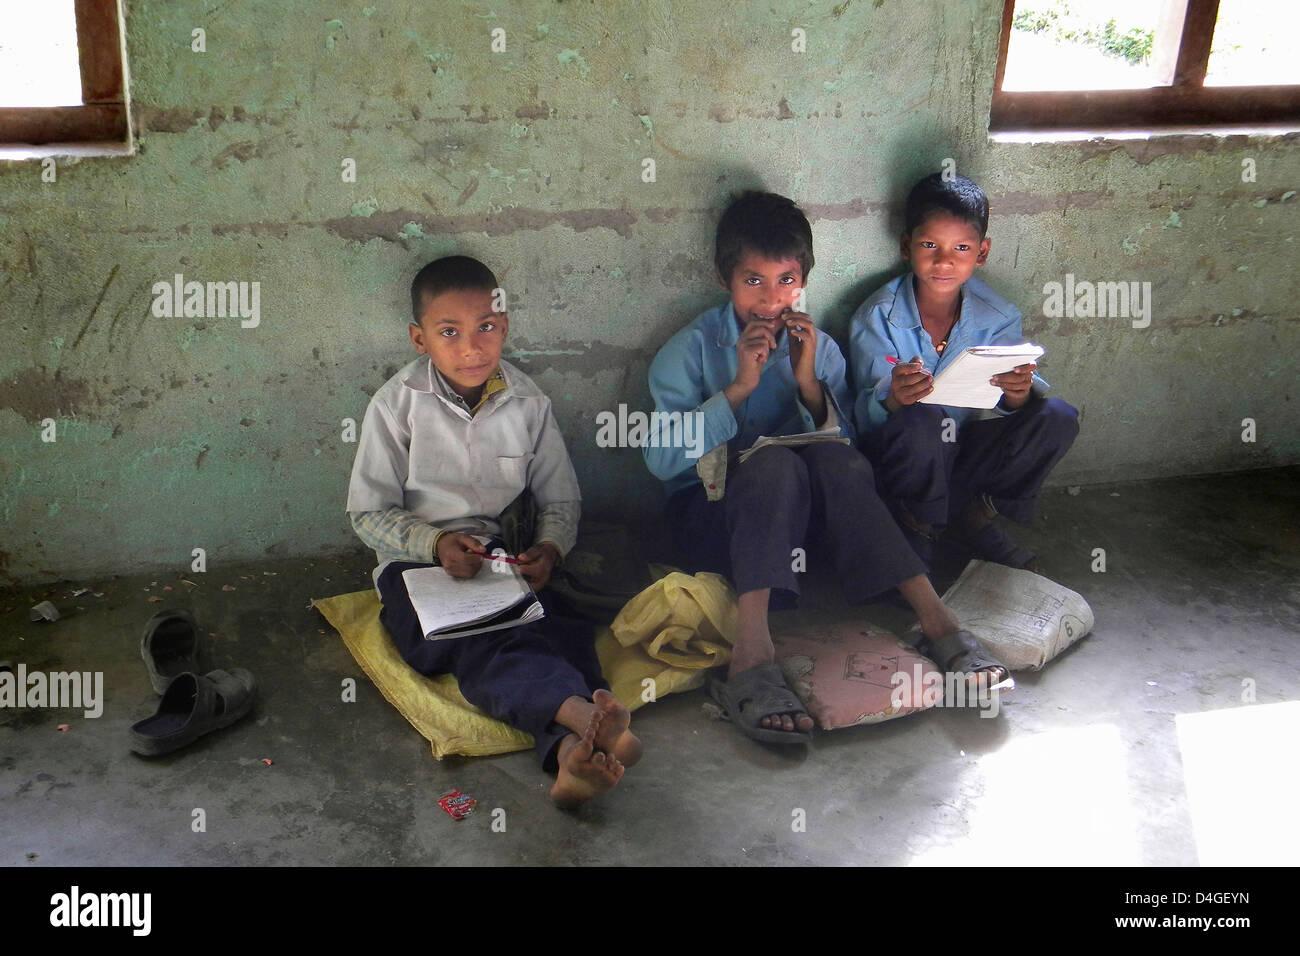 L'Inde, le Bihar, les garçons Photo Stock